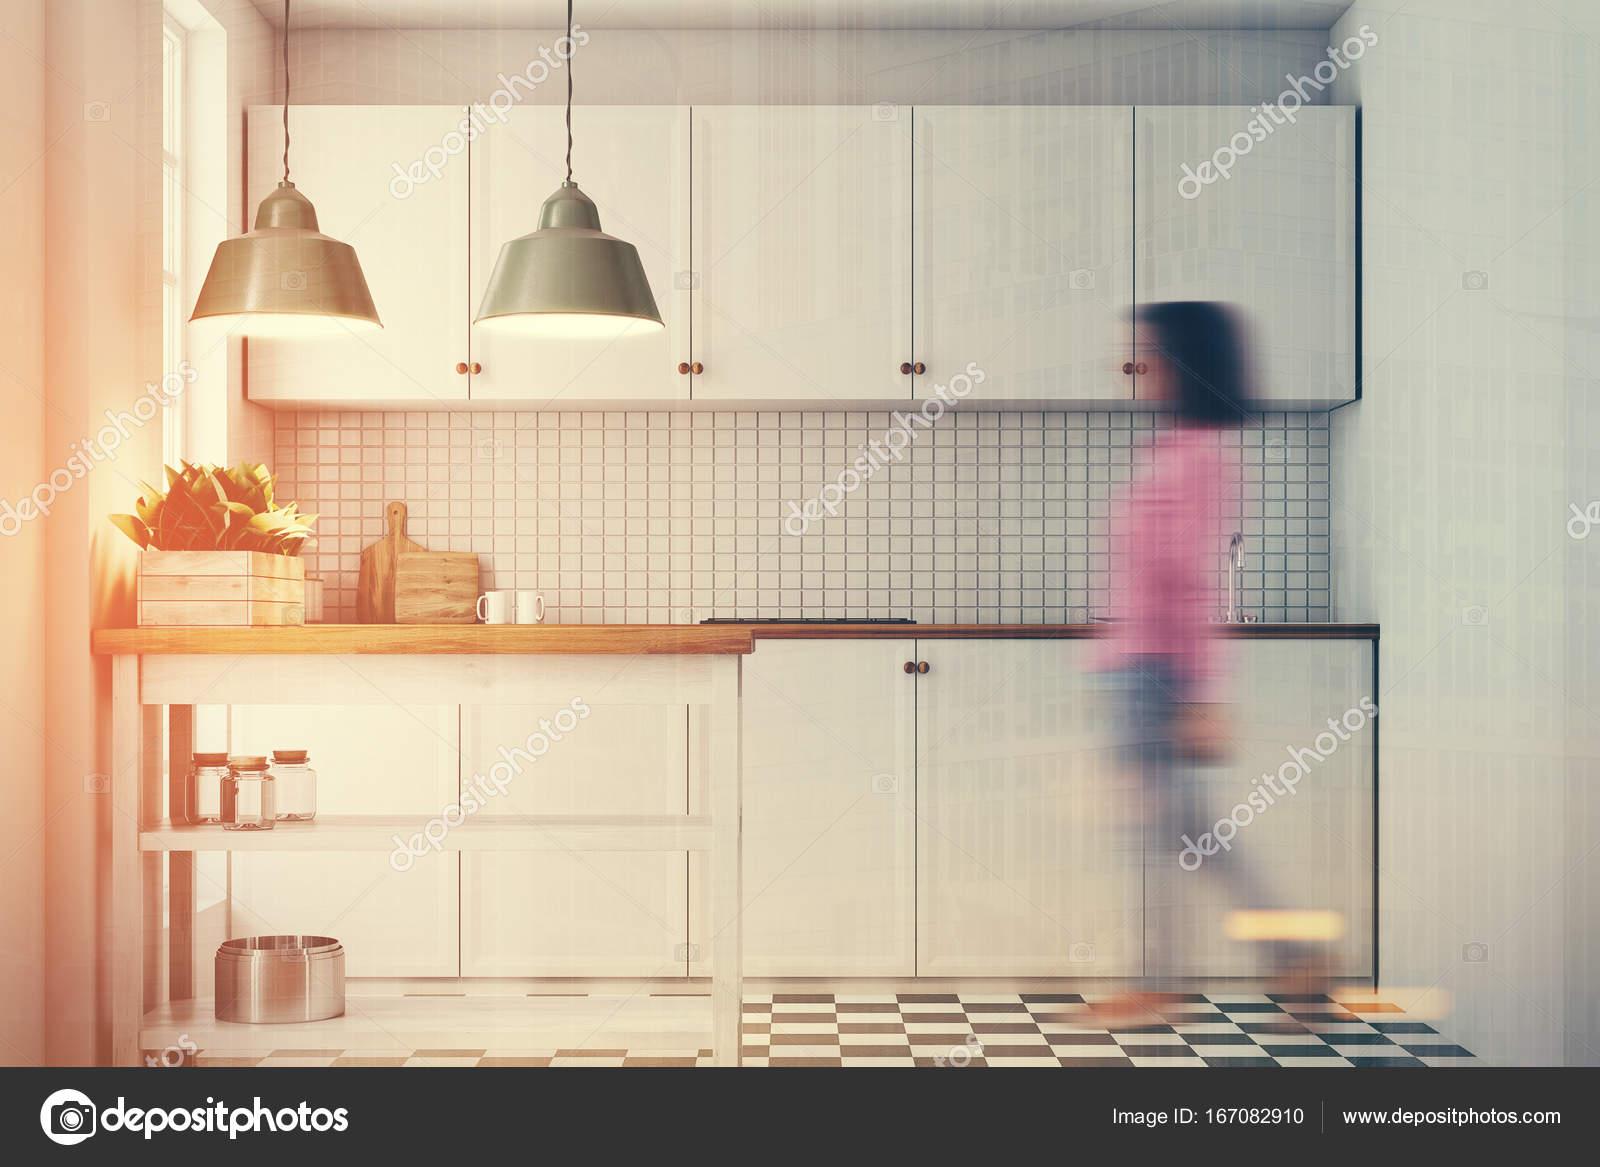 Cucina bianca interni piastrelle pavimento donna u2014 foto stock